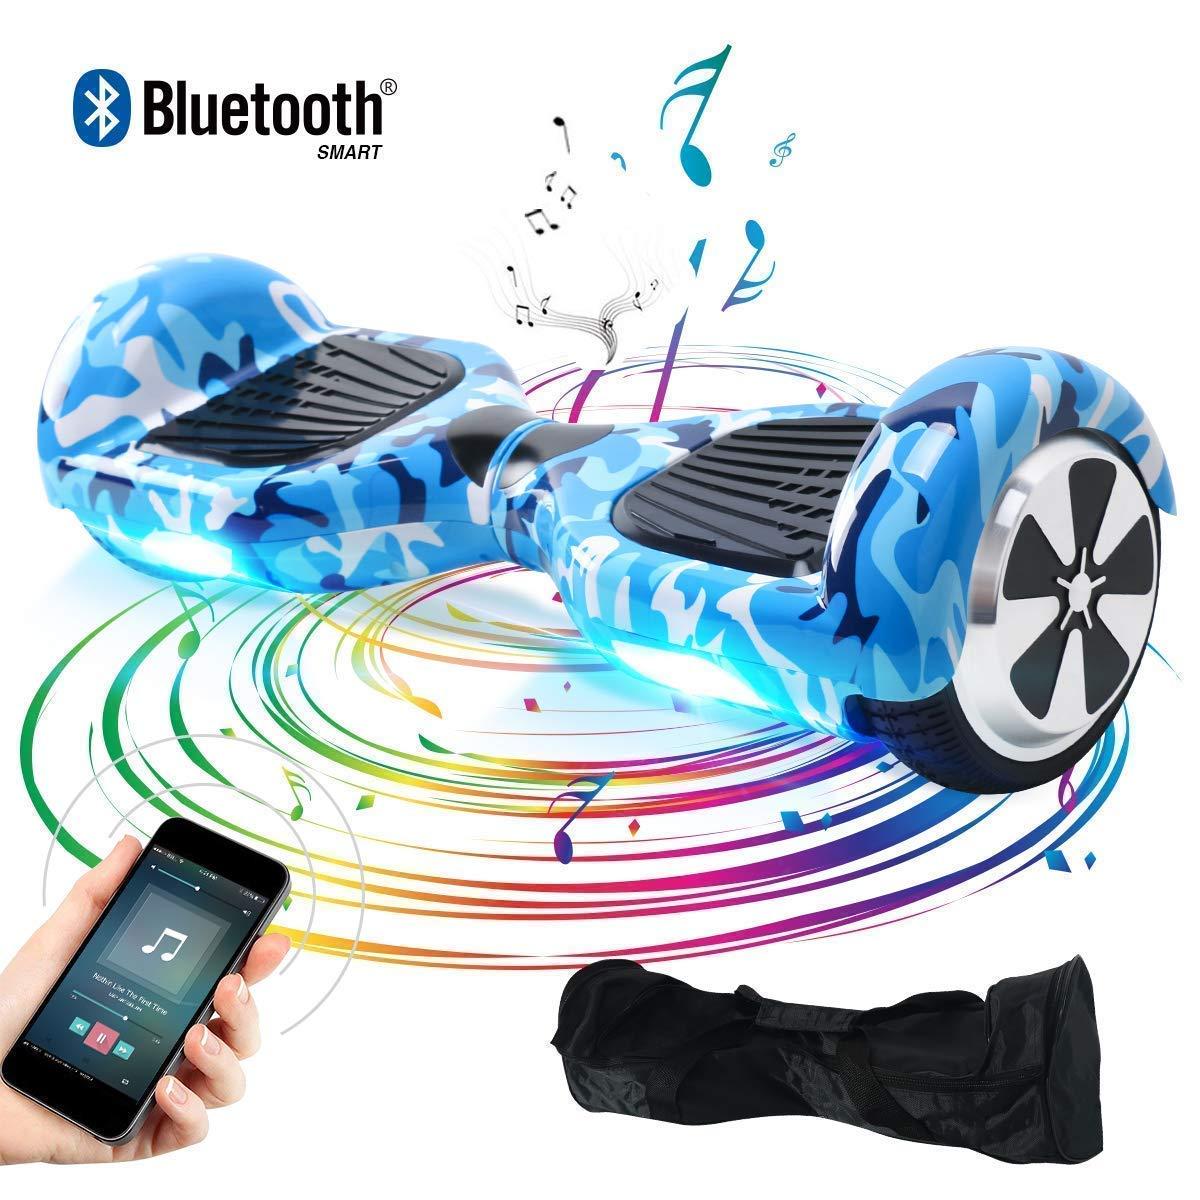 BEBK Hoverboard, 6.5 Self Balance Scooter mit Bluetooth Lautsprecher, 2 * 350W Motor, LED Lights, Elektro Scooter U1-C